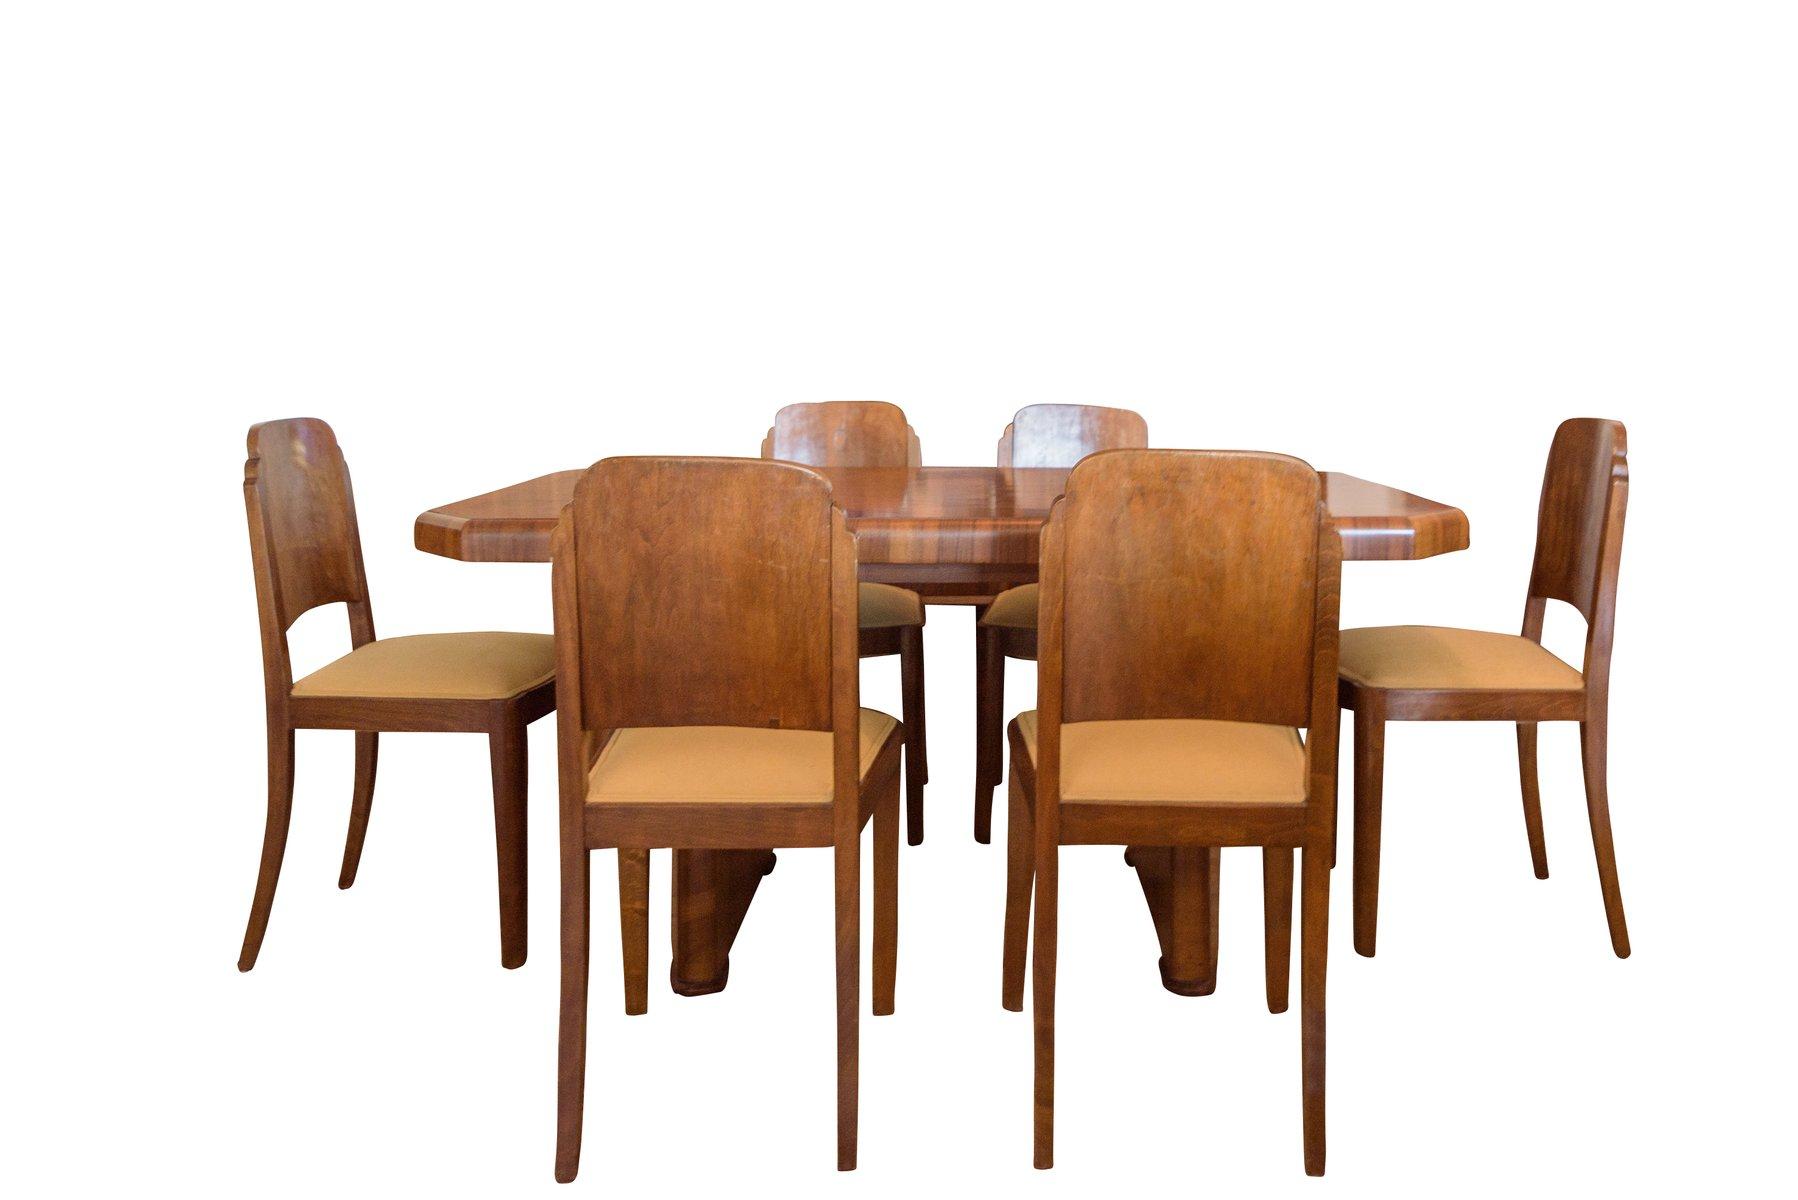 Art Deco Walnut Dining Table u0026 6 Chairs 1920s  sc 1 st  Pamono & Art Deco Walnut Dining Table u0026 6 Chairs 1920s for sale at Pamono